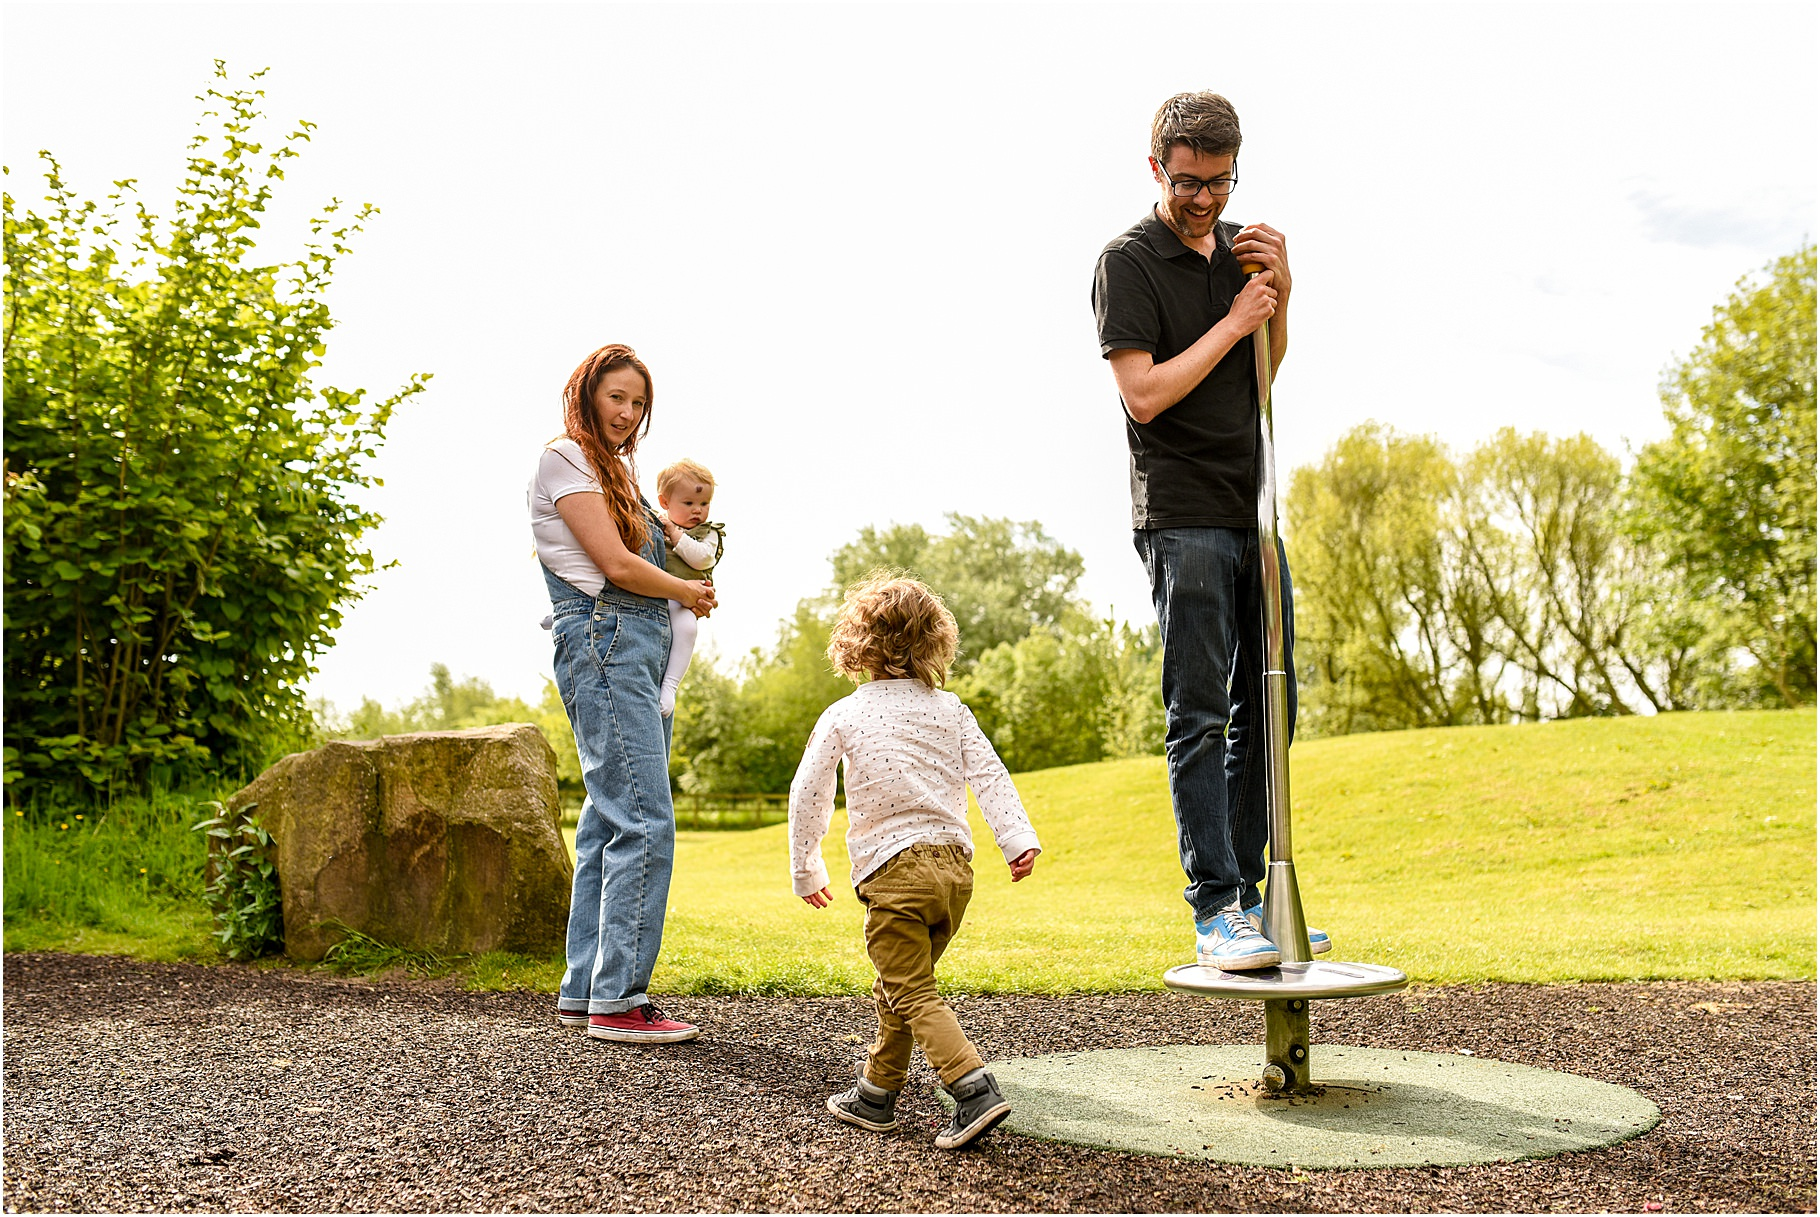 lancashire-family-photographer-06.jpg